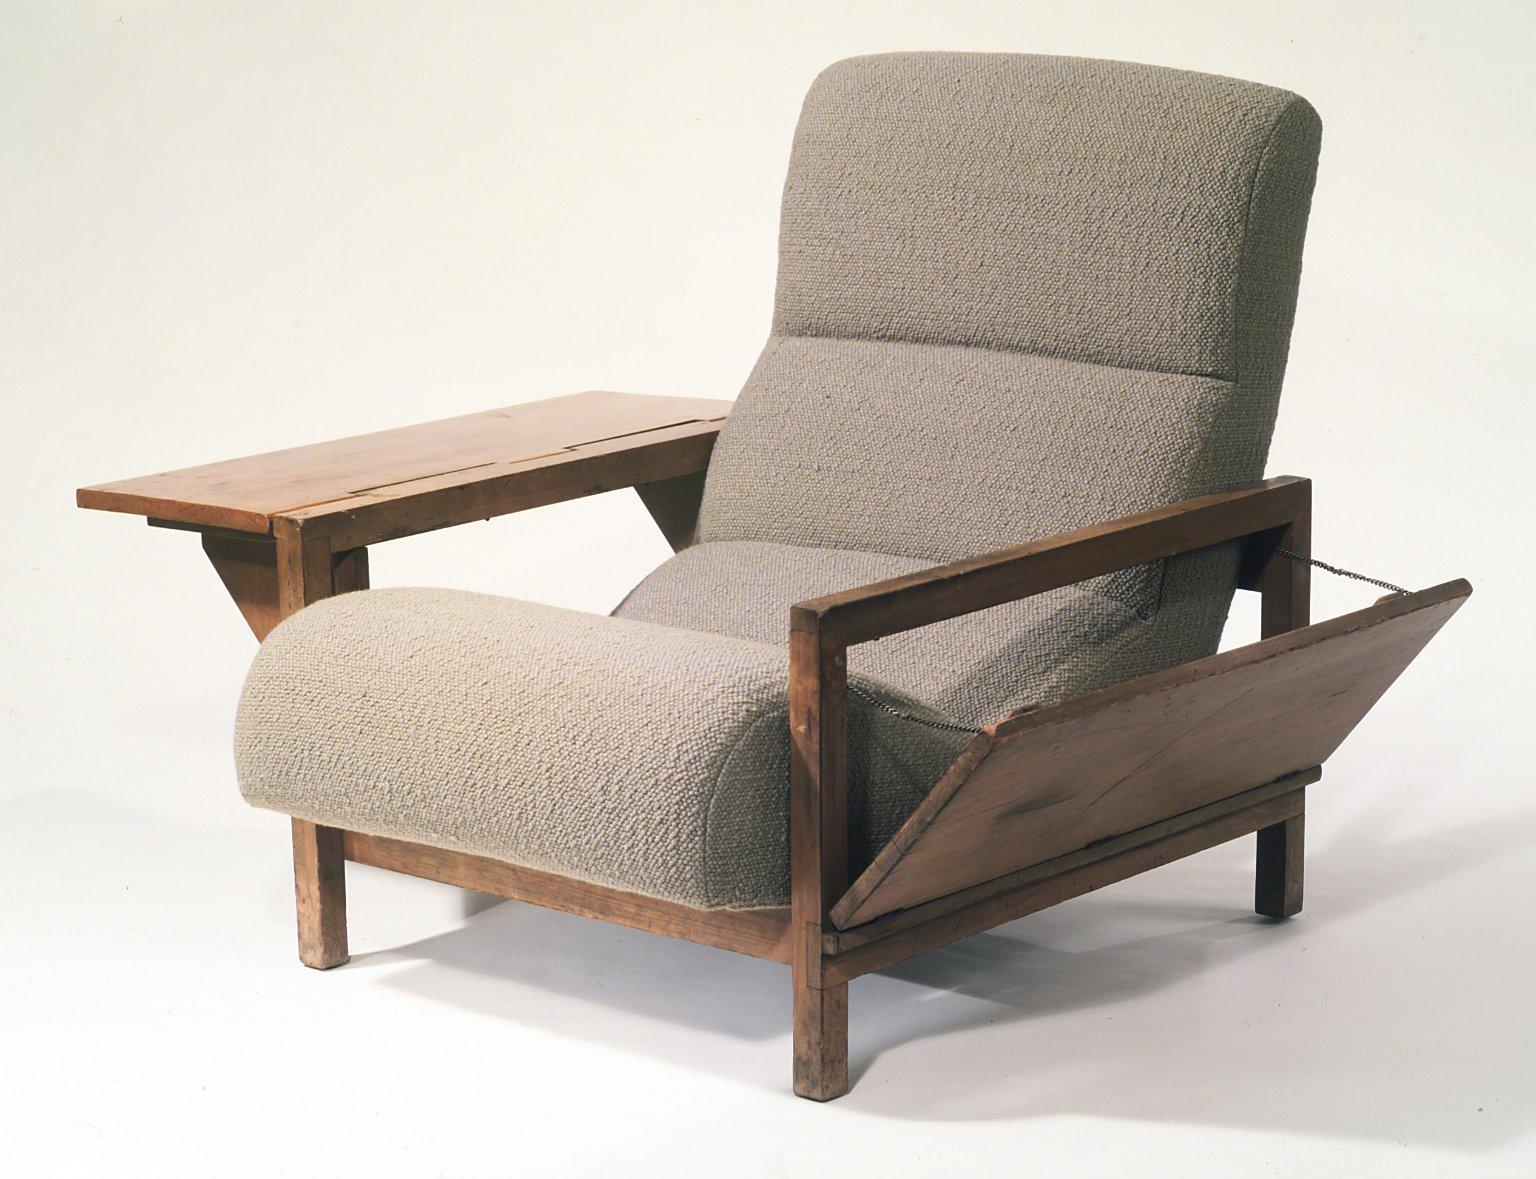 Image Result For Retro Bedroom Furniture